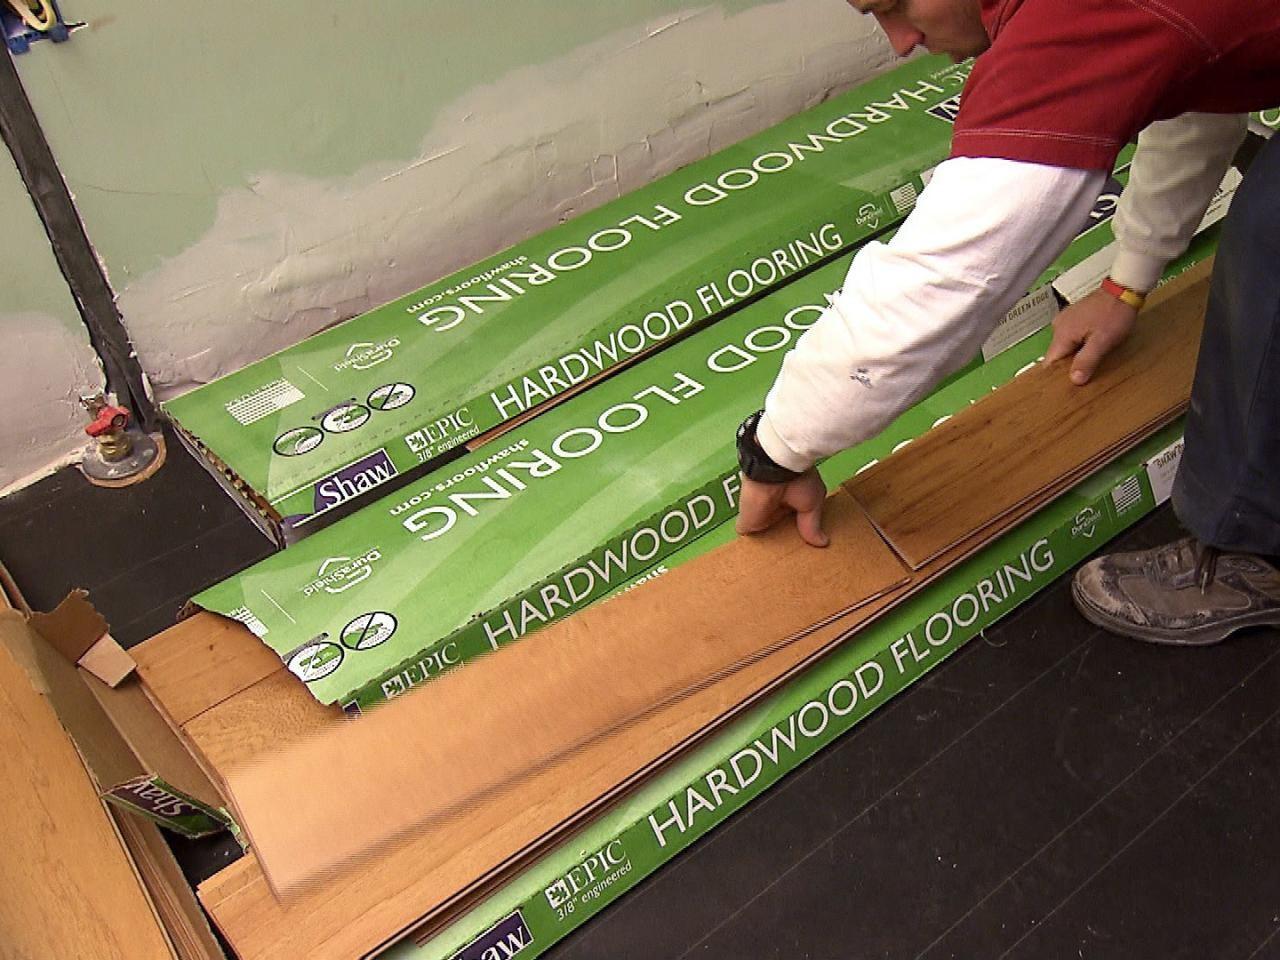 walnut hardwood flooring pros cons of 14 new average cost for hardwood floors stock dizpos com inside average cost for hardwood floors awesome how to install an engineered hardwood floor how tos stock